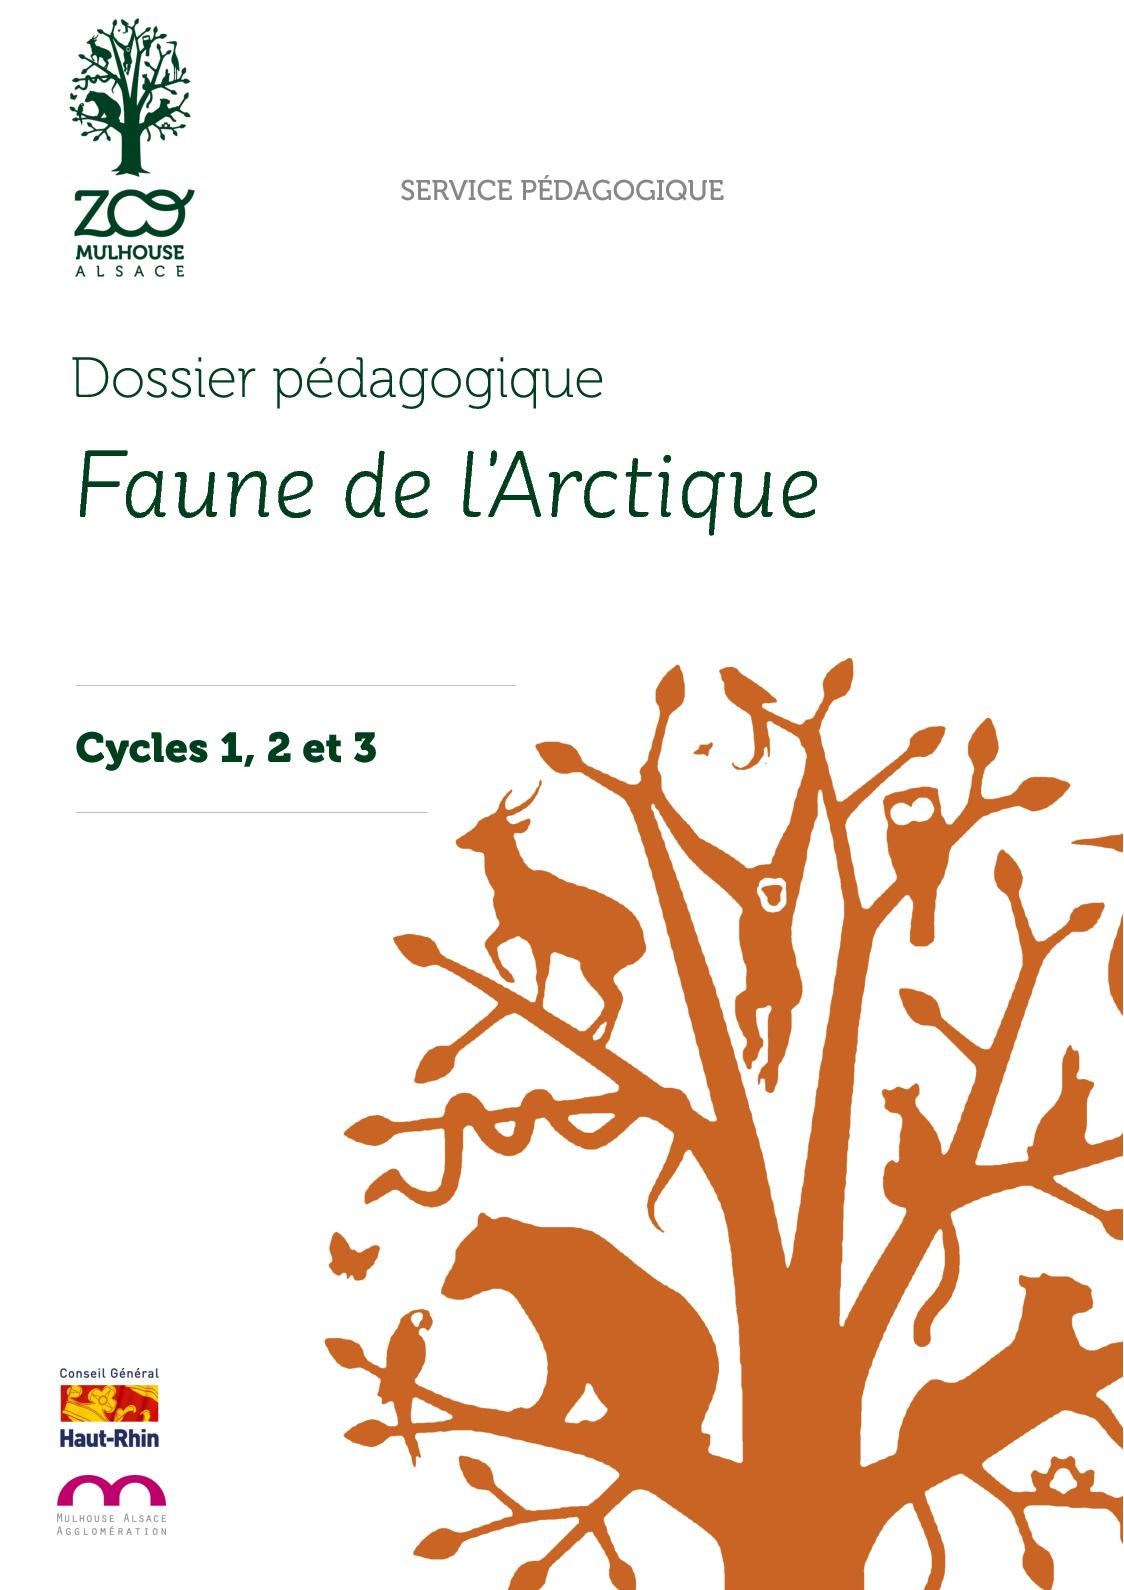 La Faune de l'Arctique (cycles 1-2-3)